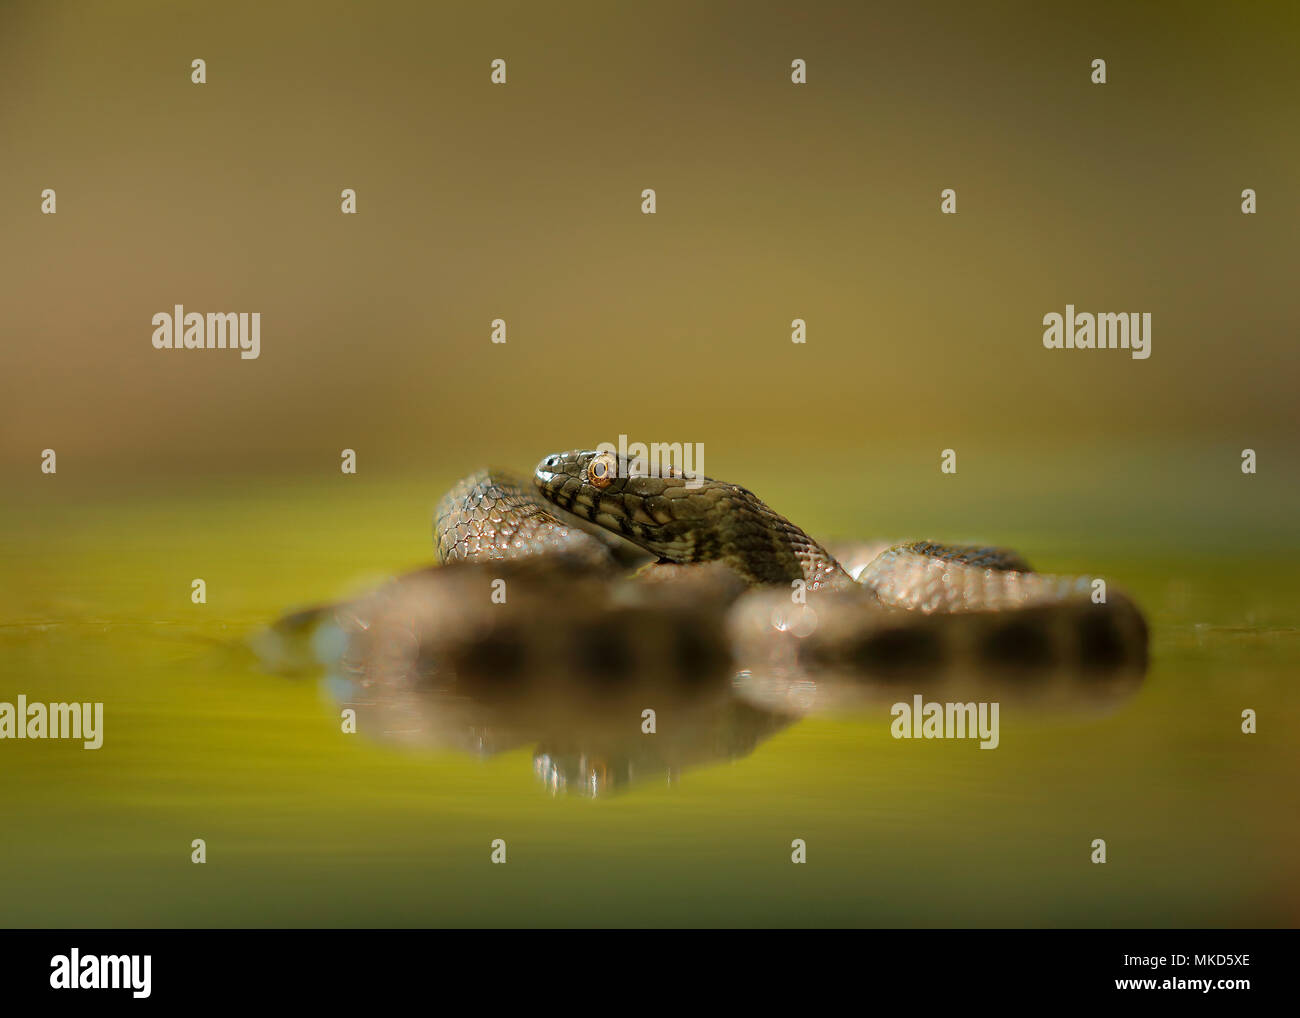 Dice snake (Natrix tessellata) in water, Bulgaria - Stock Image